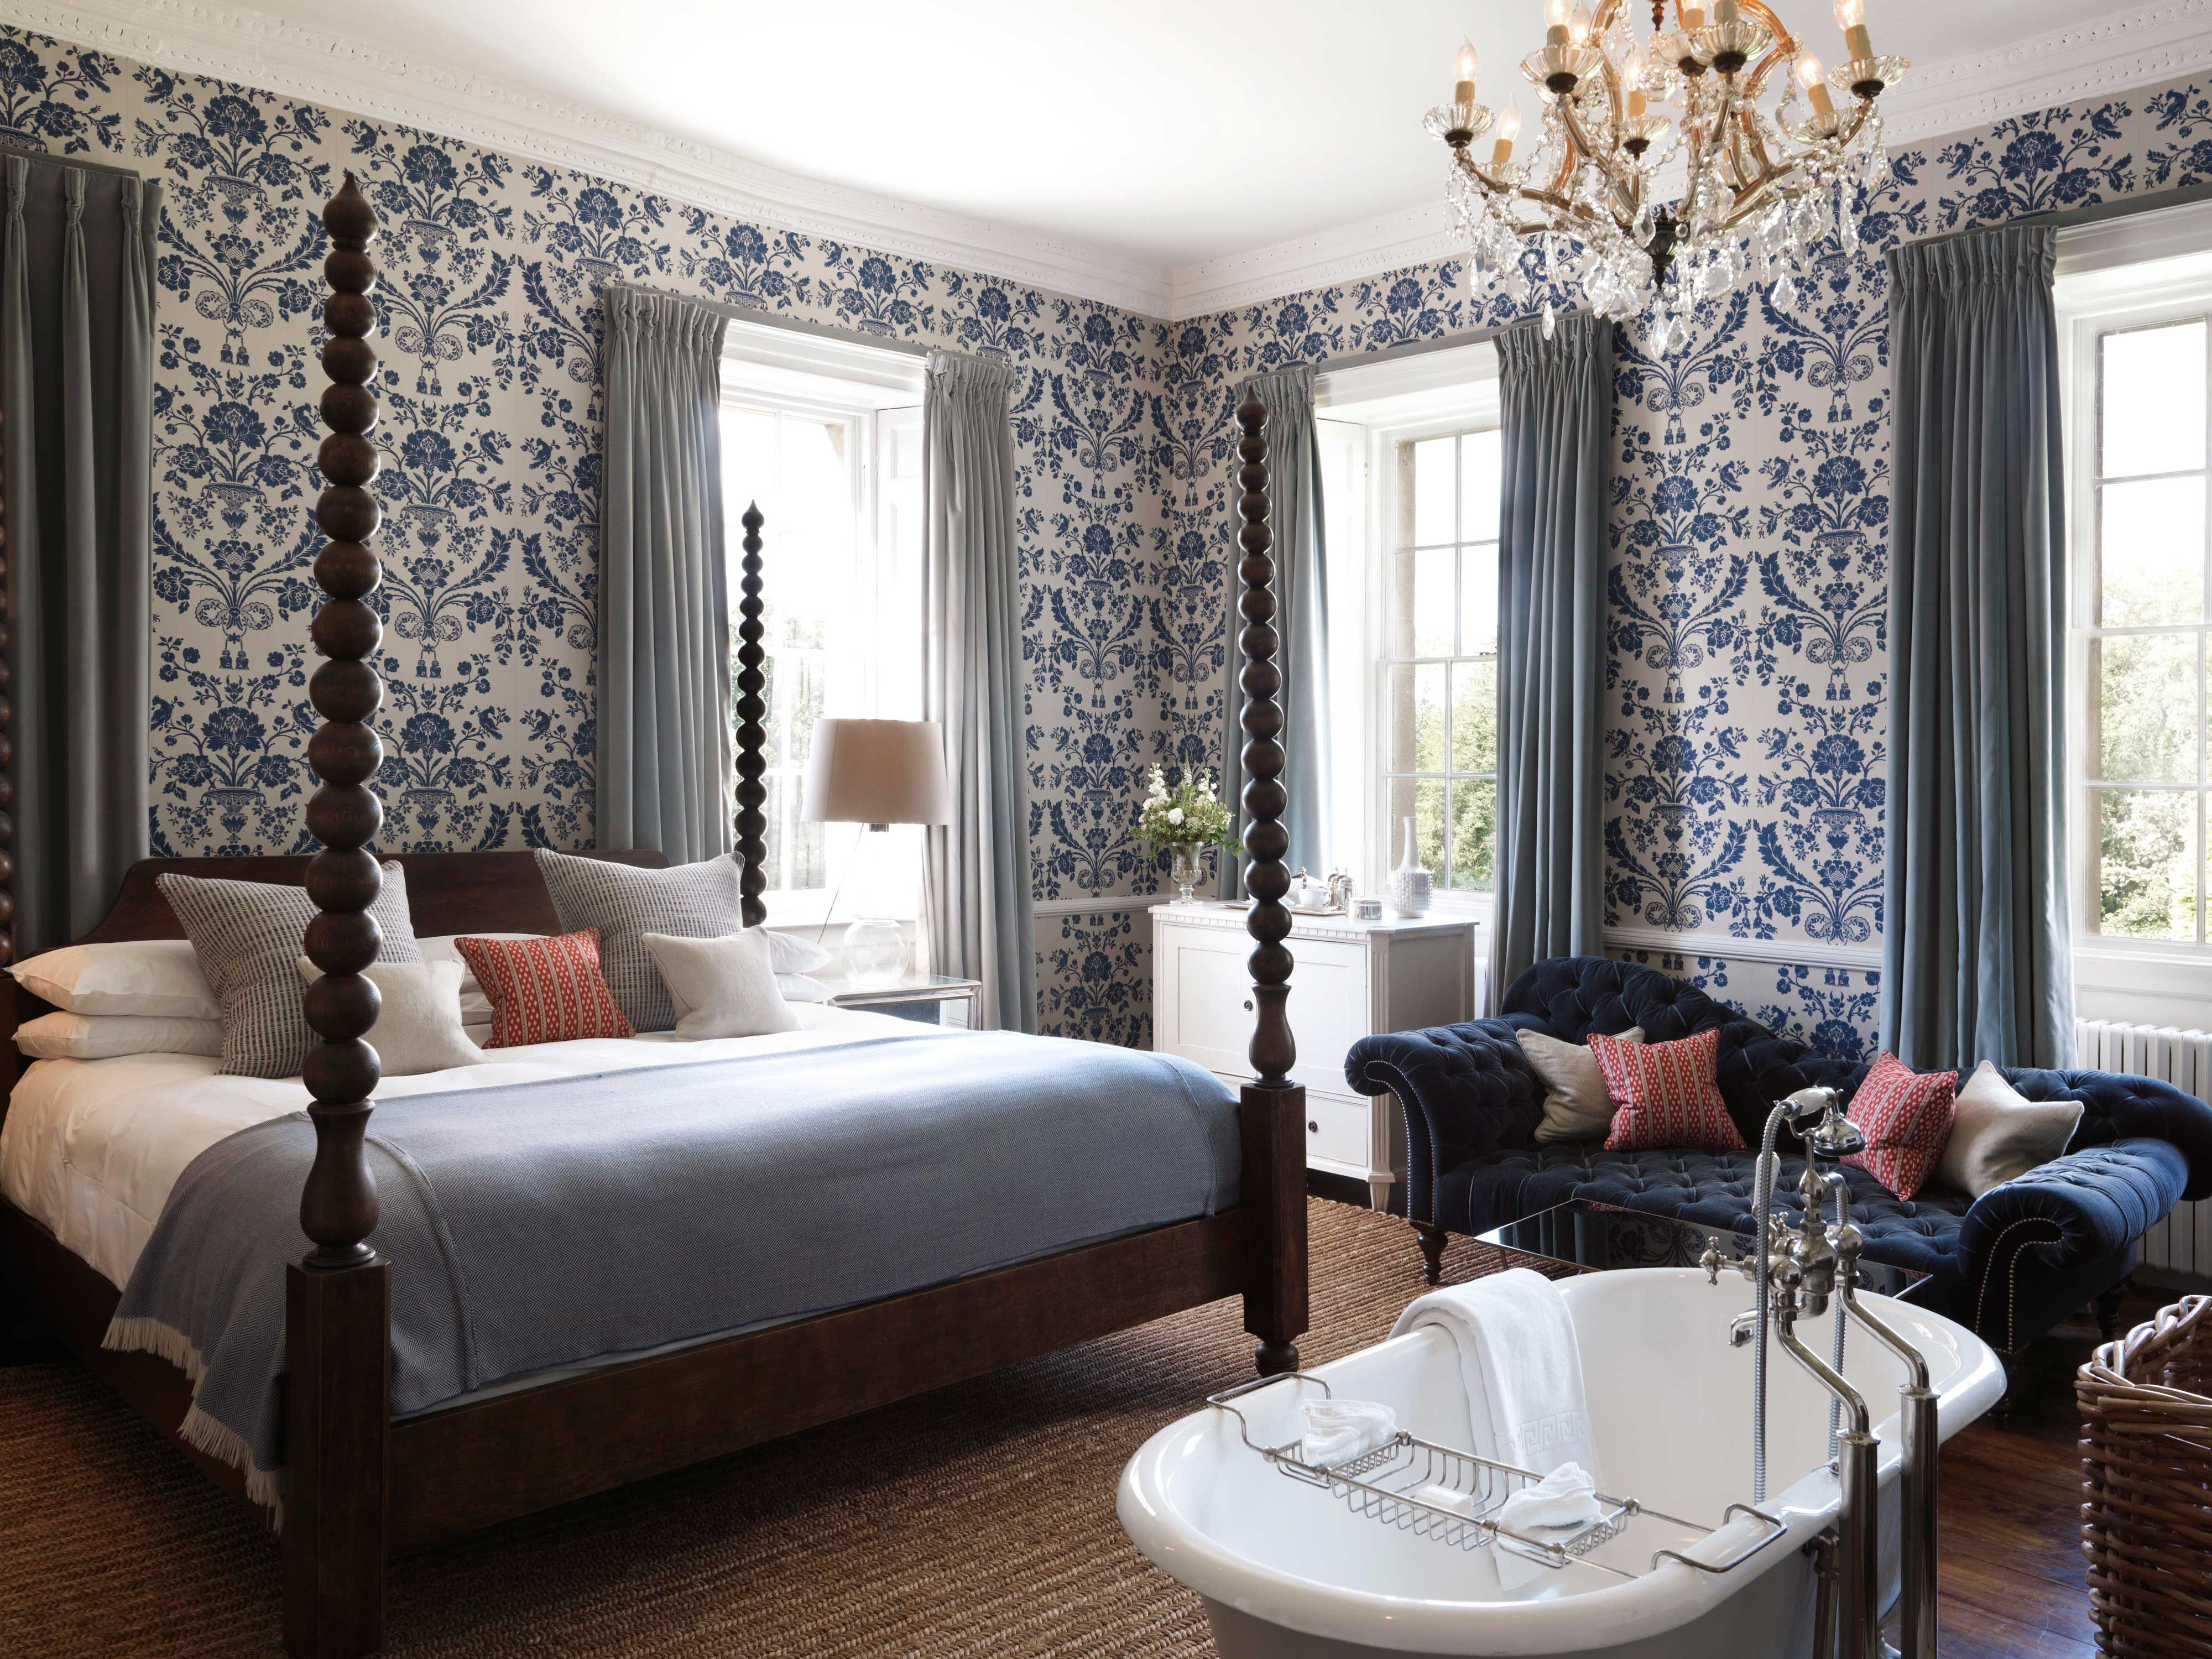 5 ways to upgrade your bedroom design this autumn